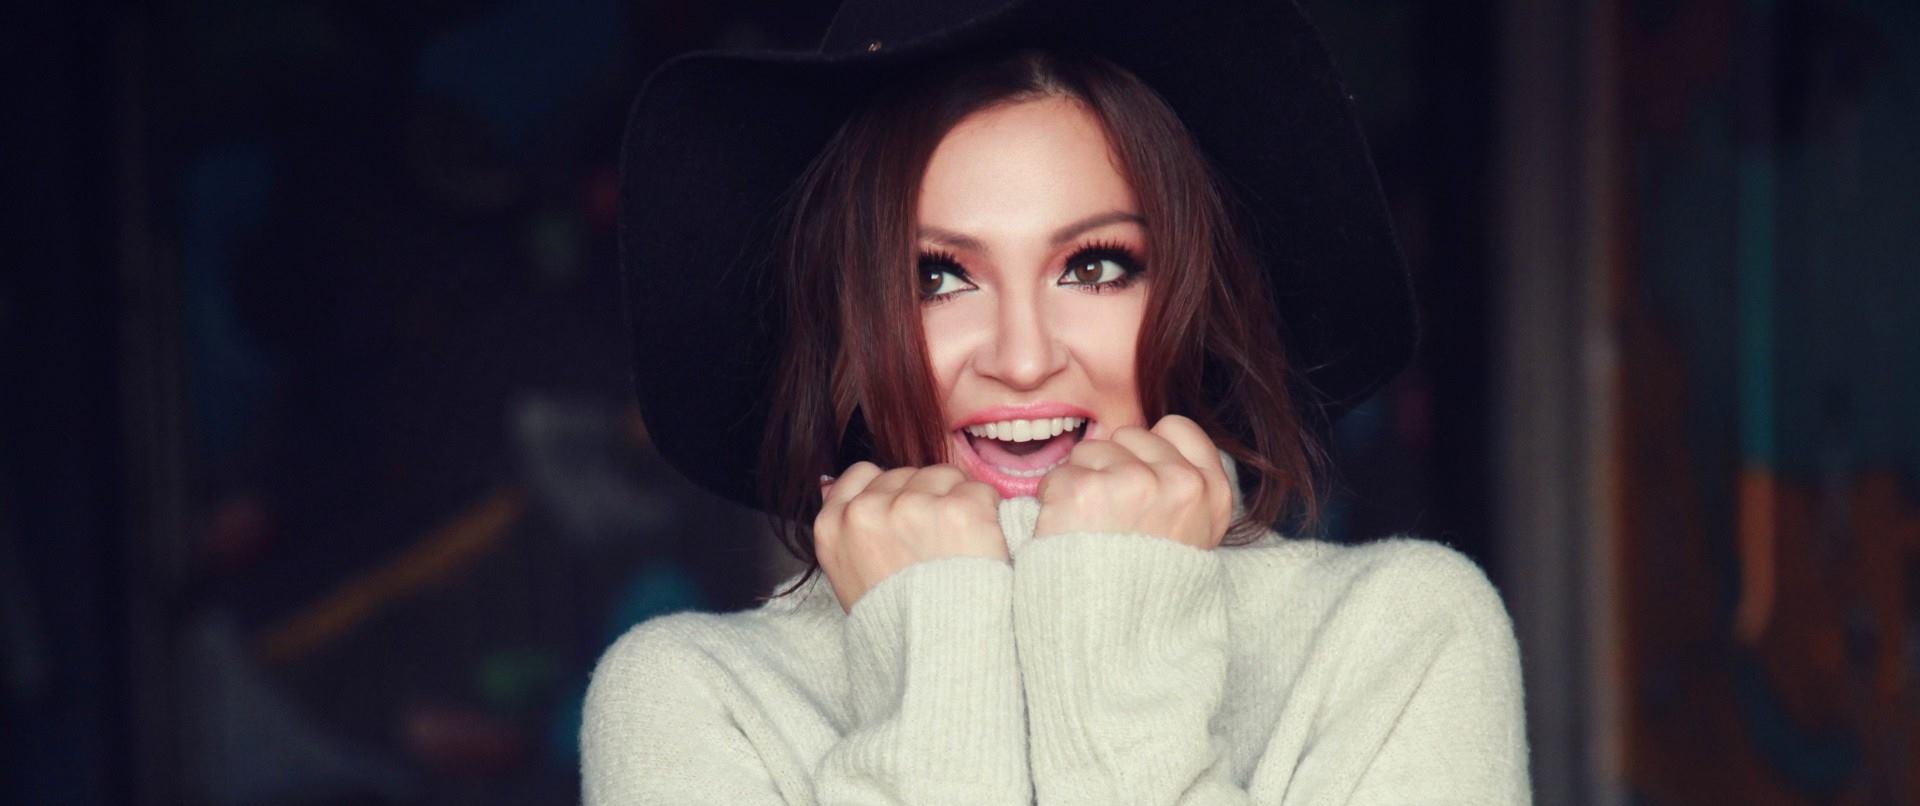 Nina Badrić je gošća humanitarnog gala-koncerta 'Četiri Tenora i prijatelji'